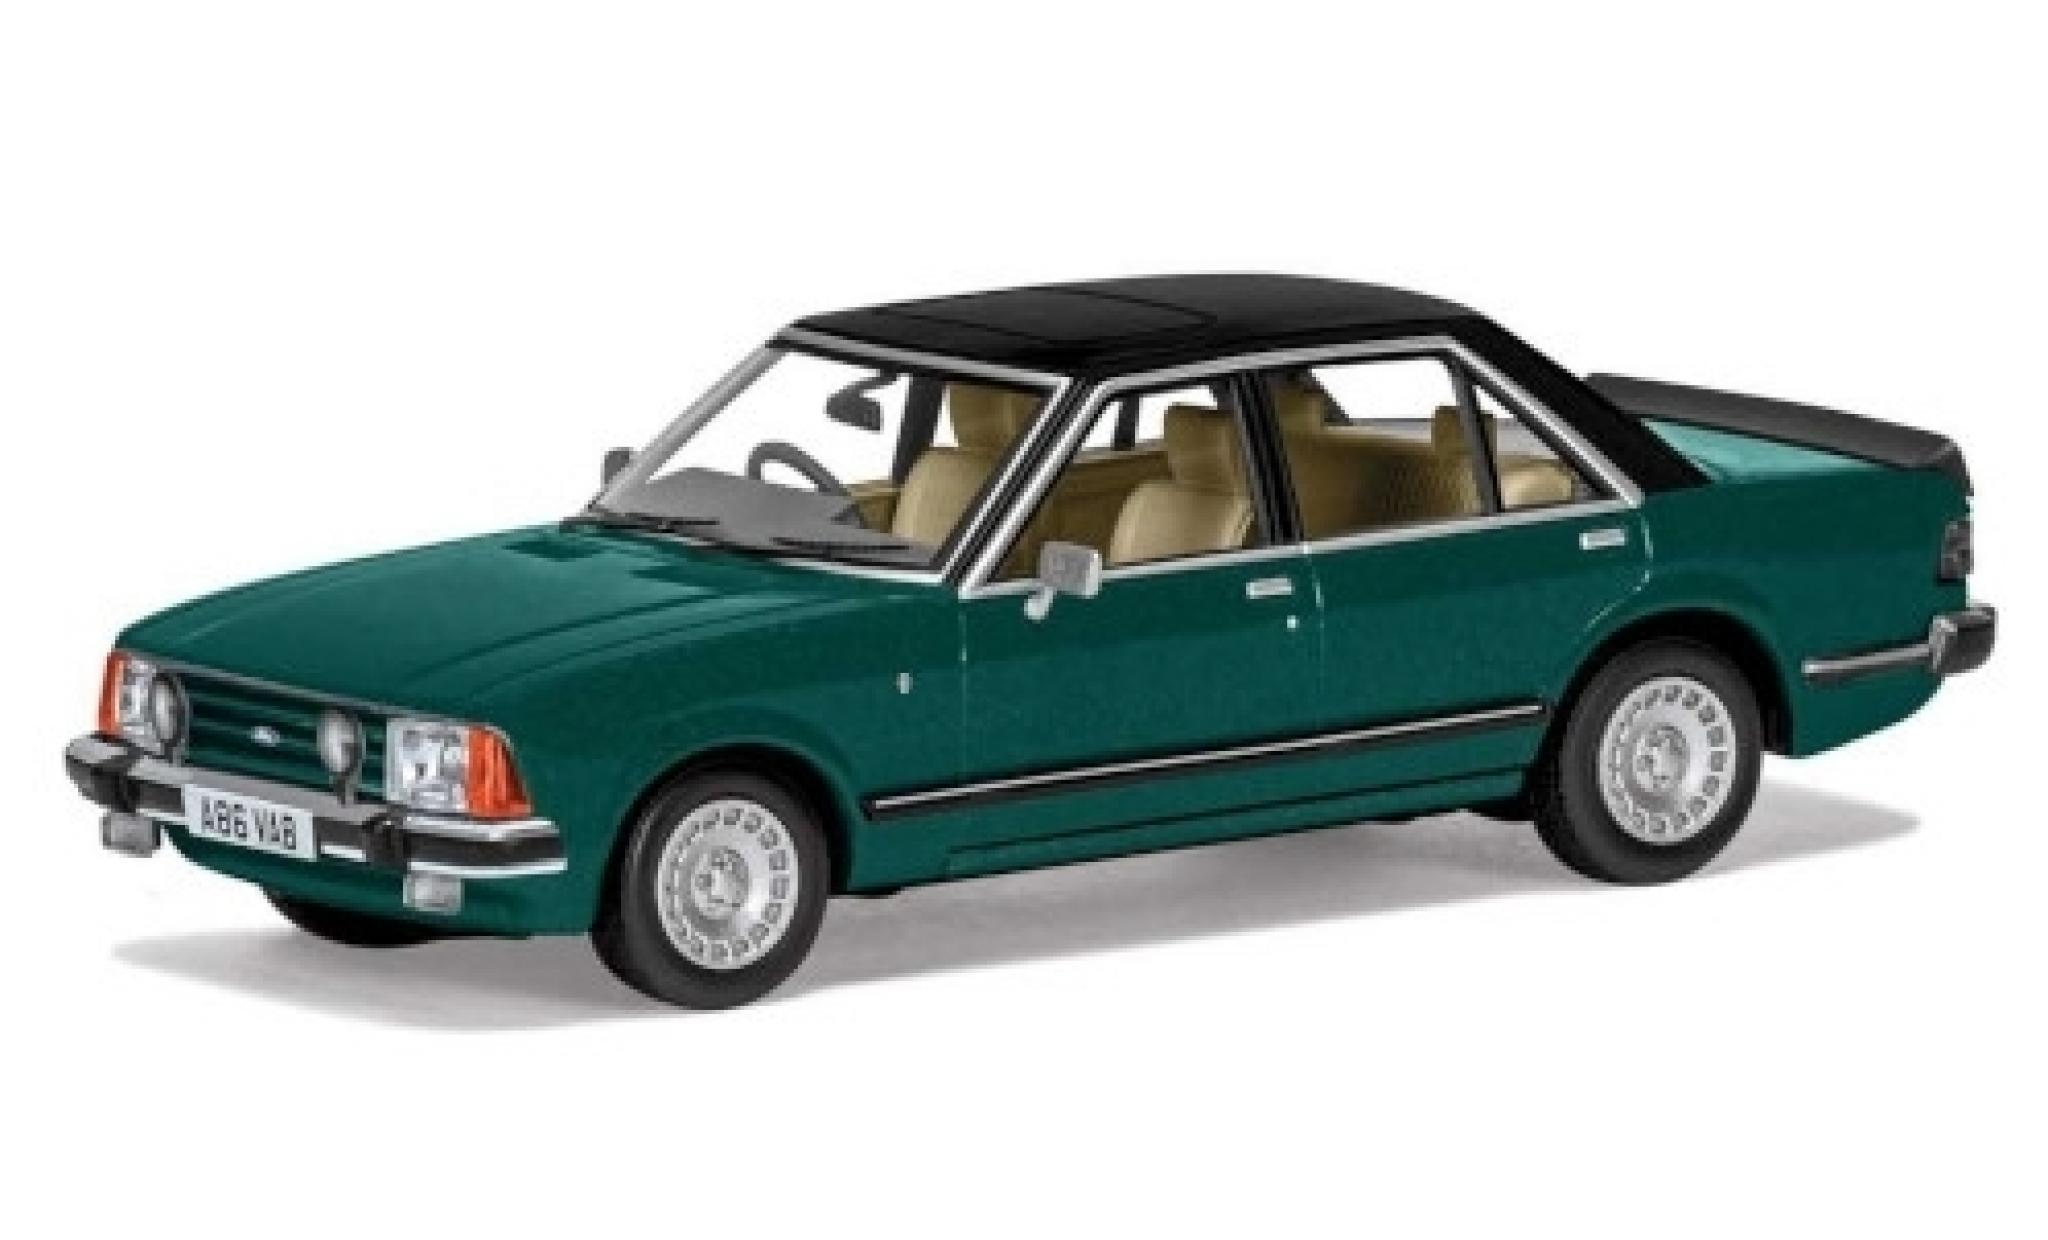 Ford Granada 1/43 Vanguards MkII 2.8i Ghia verte/matt-marron RHD 1977